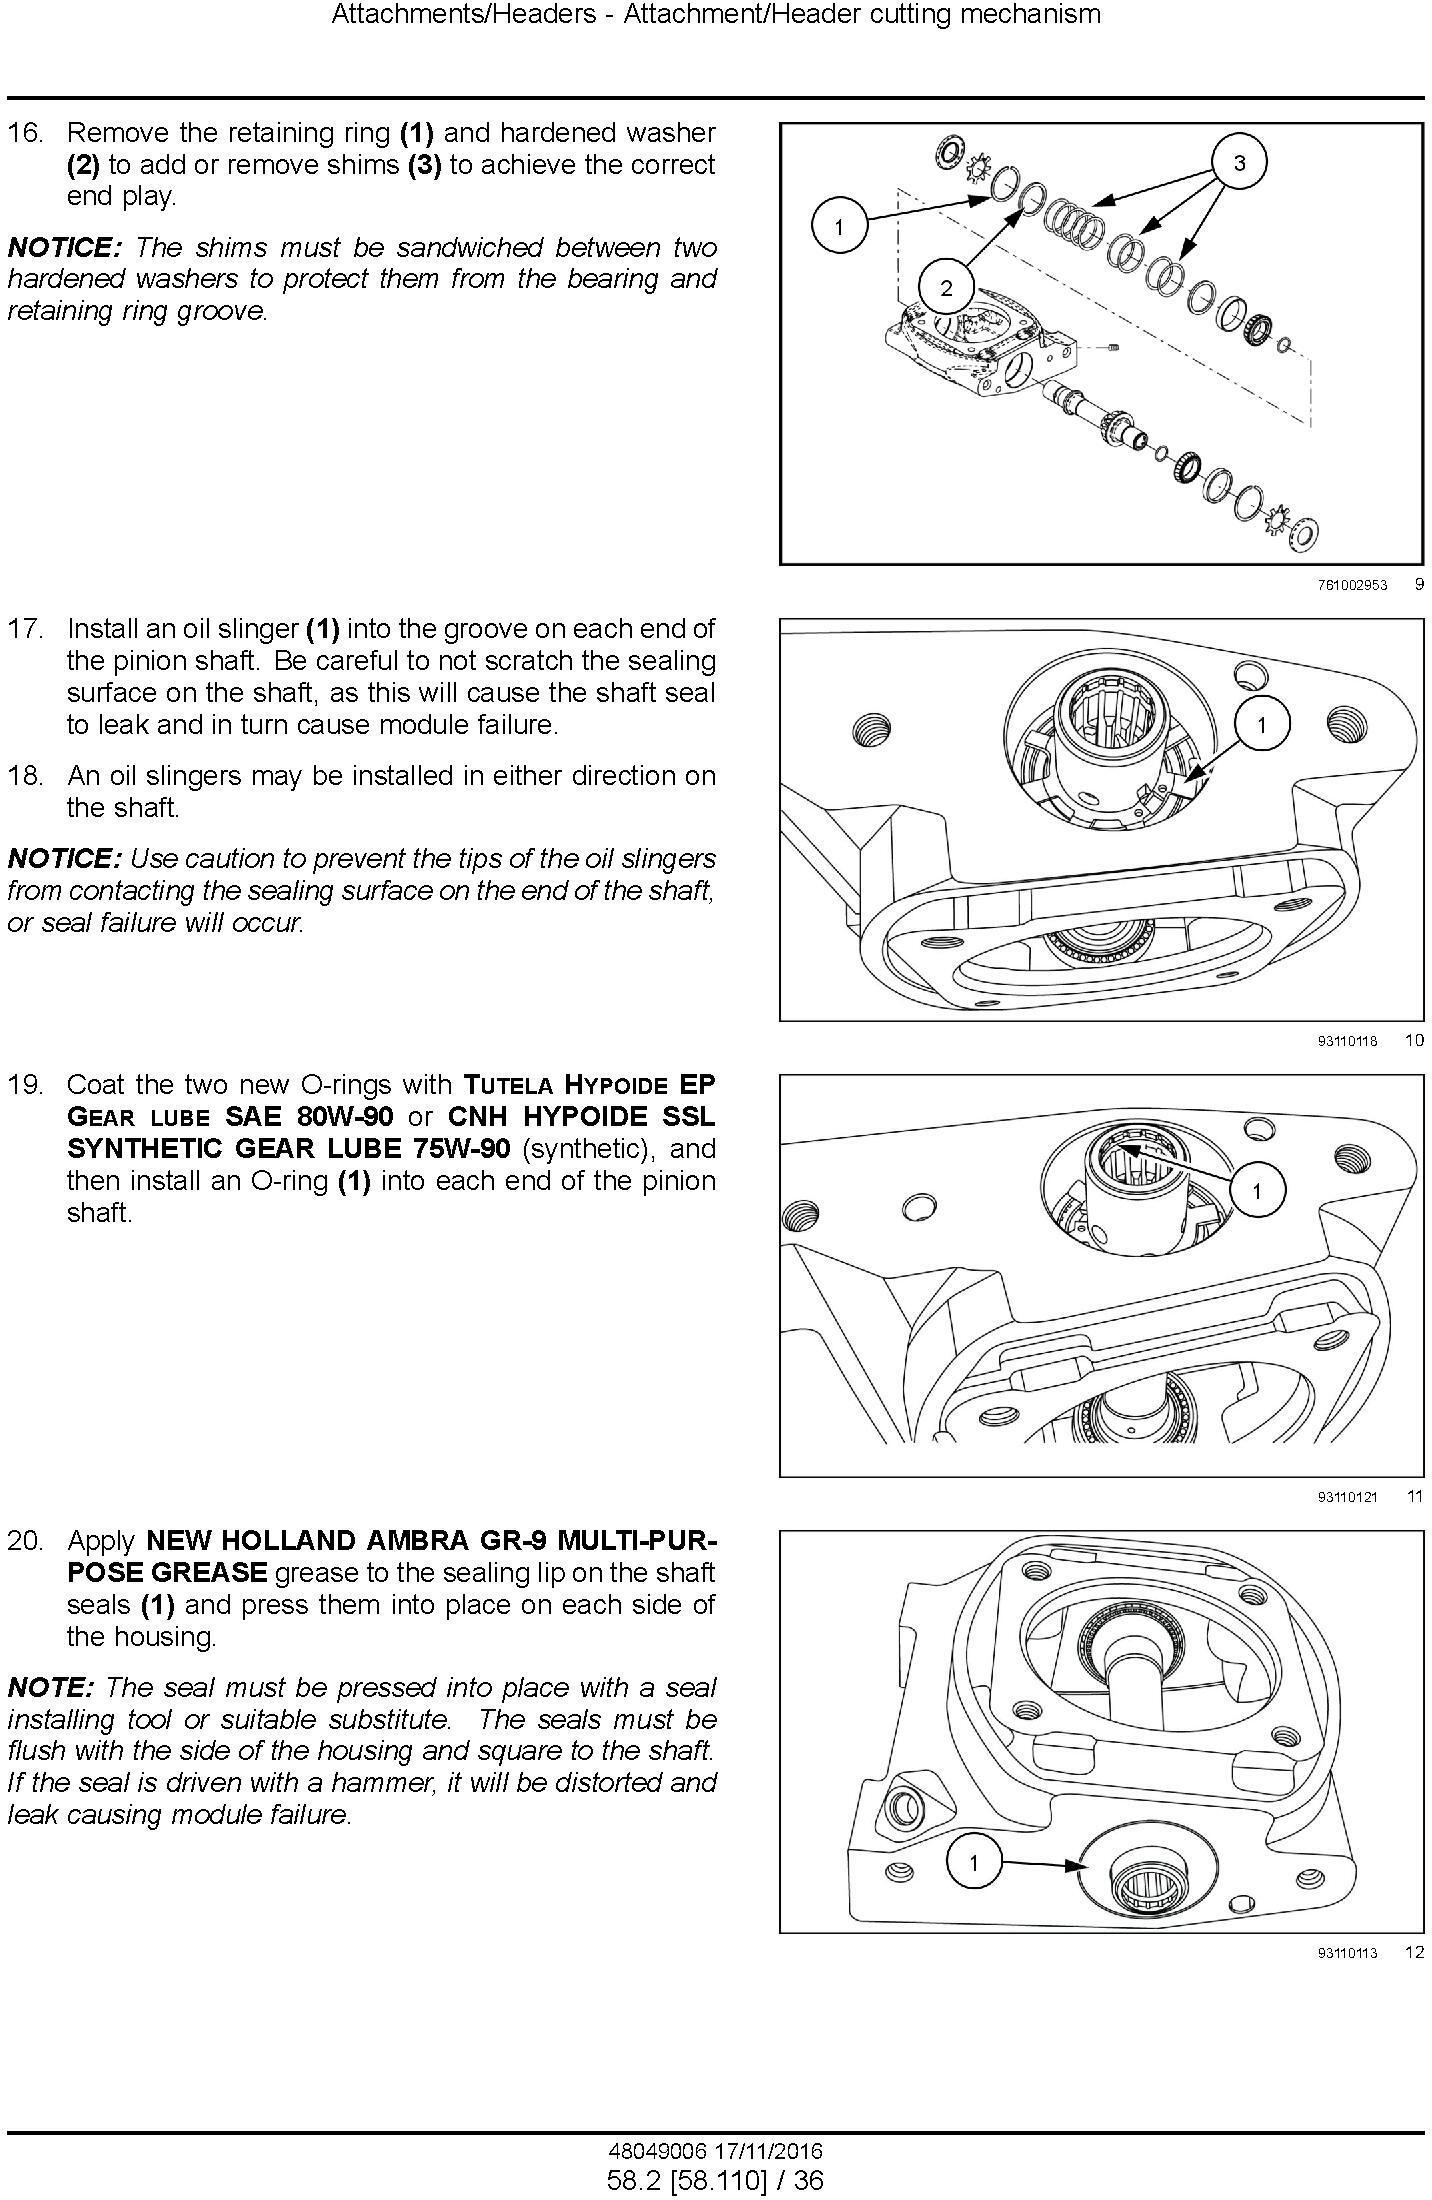 New Holland Durabine 416, 419, Durabine 416 Specialty Disc header Service Manual - 3